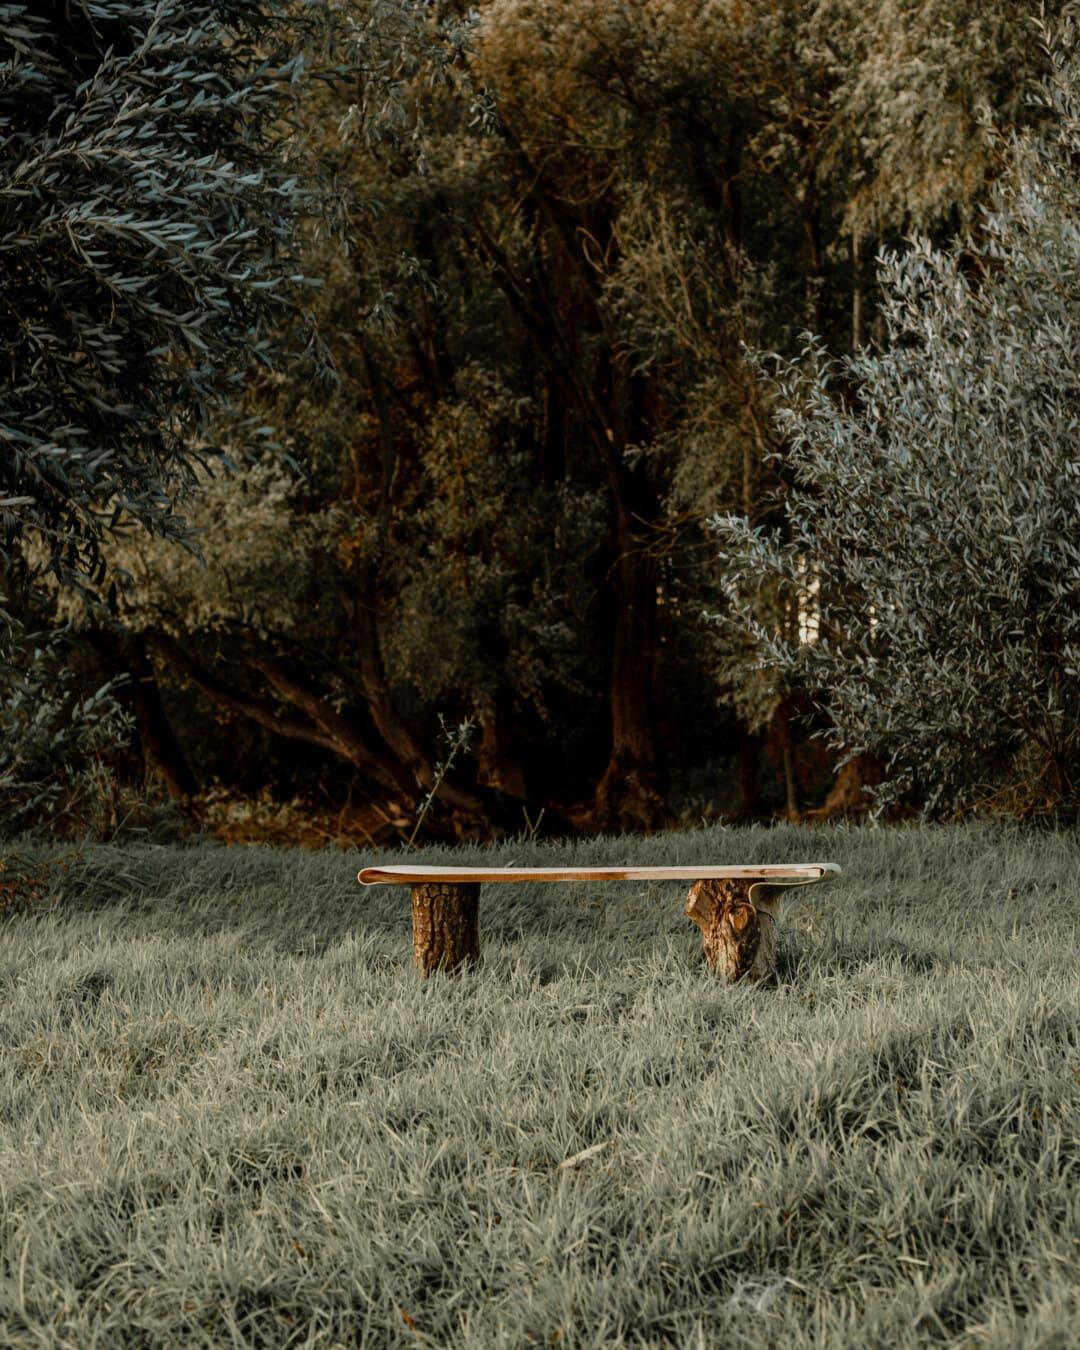 rural, bench, abandoned, grassy, trees, september, autumn season, tree, forest, landscape